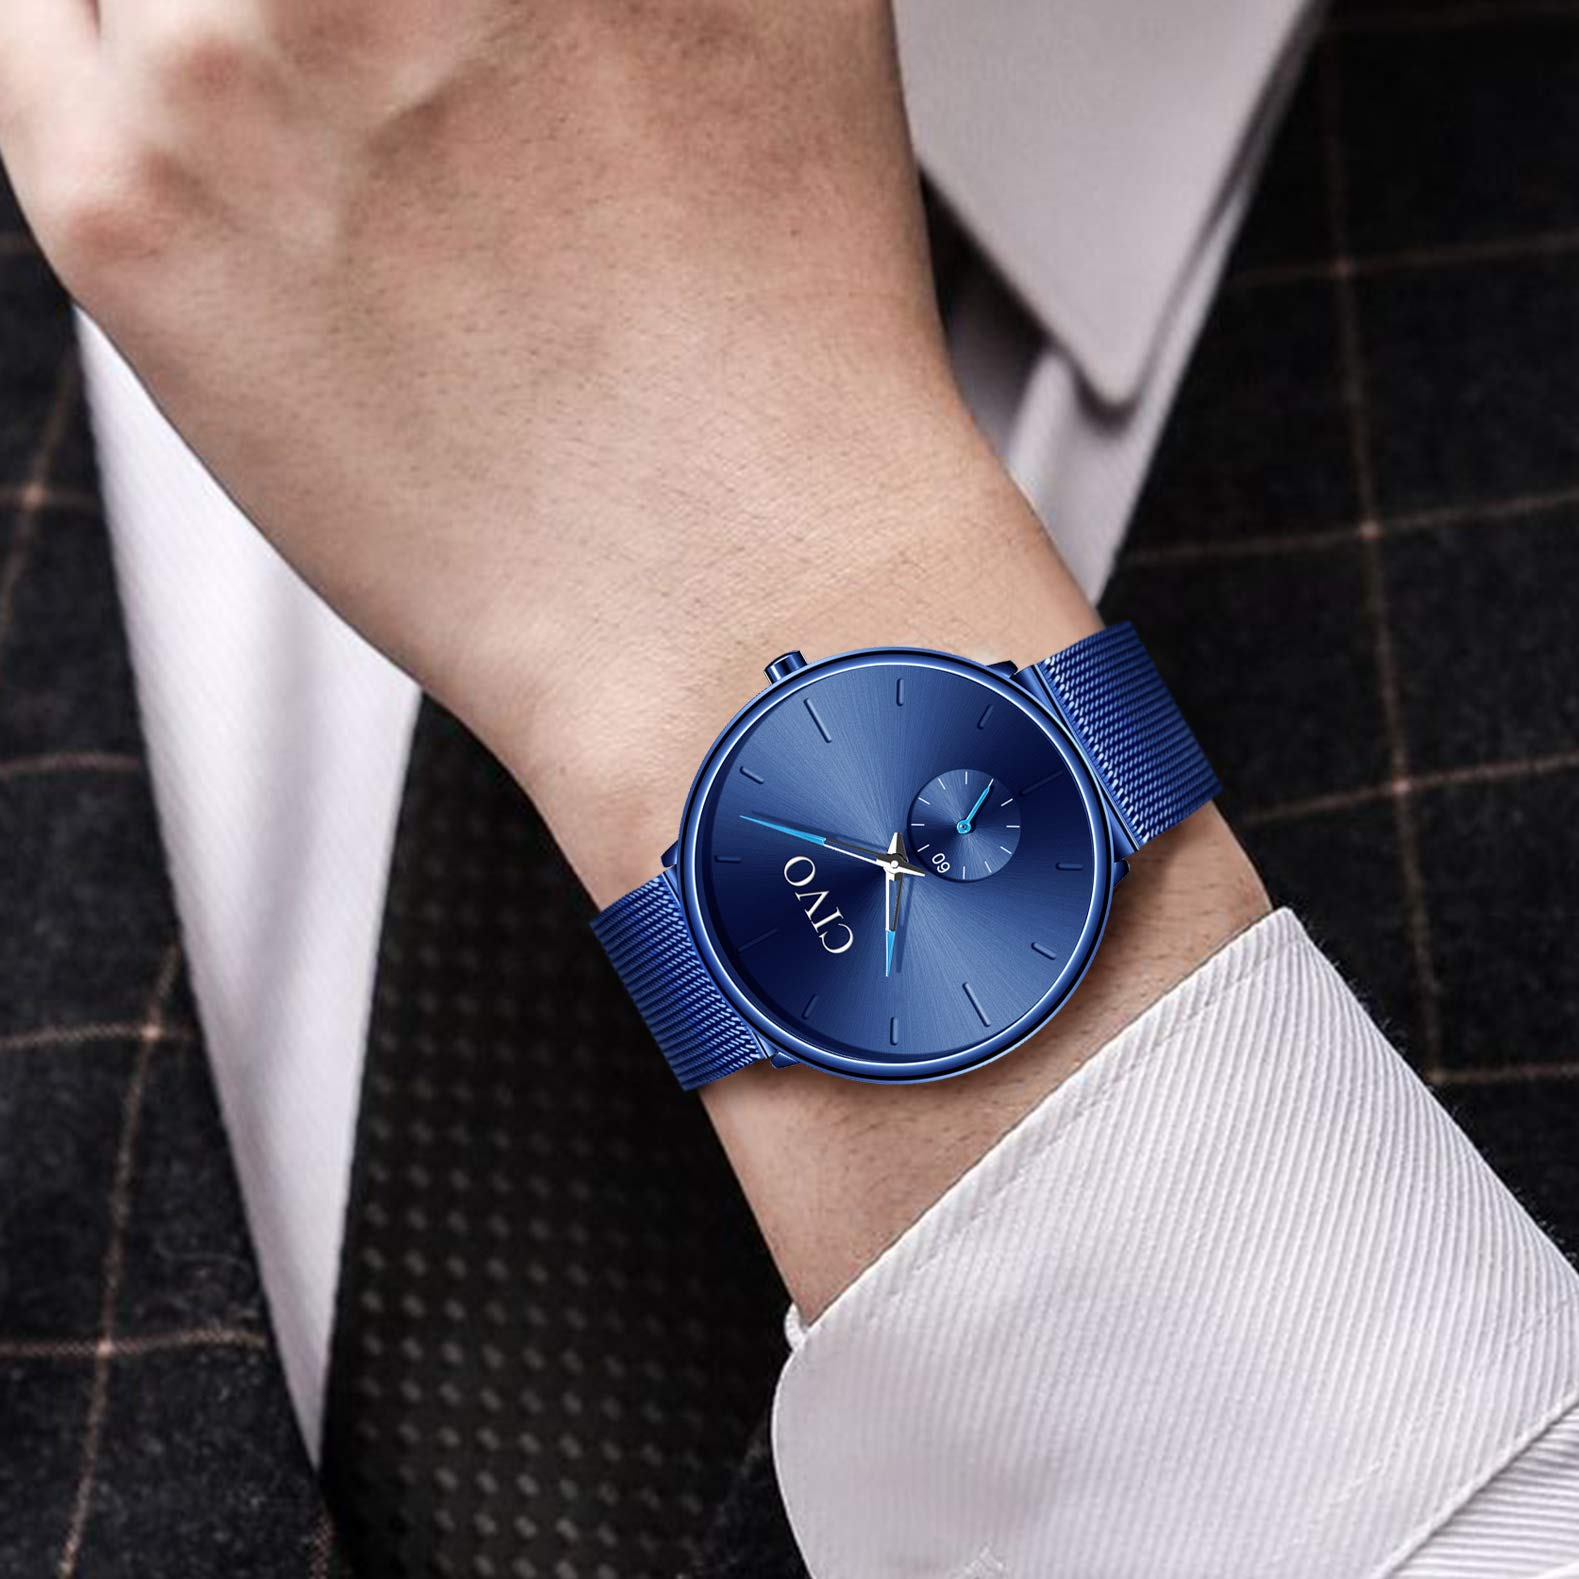 24378d08dd8a Inicio   Baratos   CIVO Relojes de Hombre Lujo Impermeable Ultra Fino Reloj  de Acero Inoxidable Minimalista Moda Deportivo ...